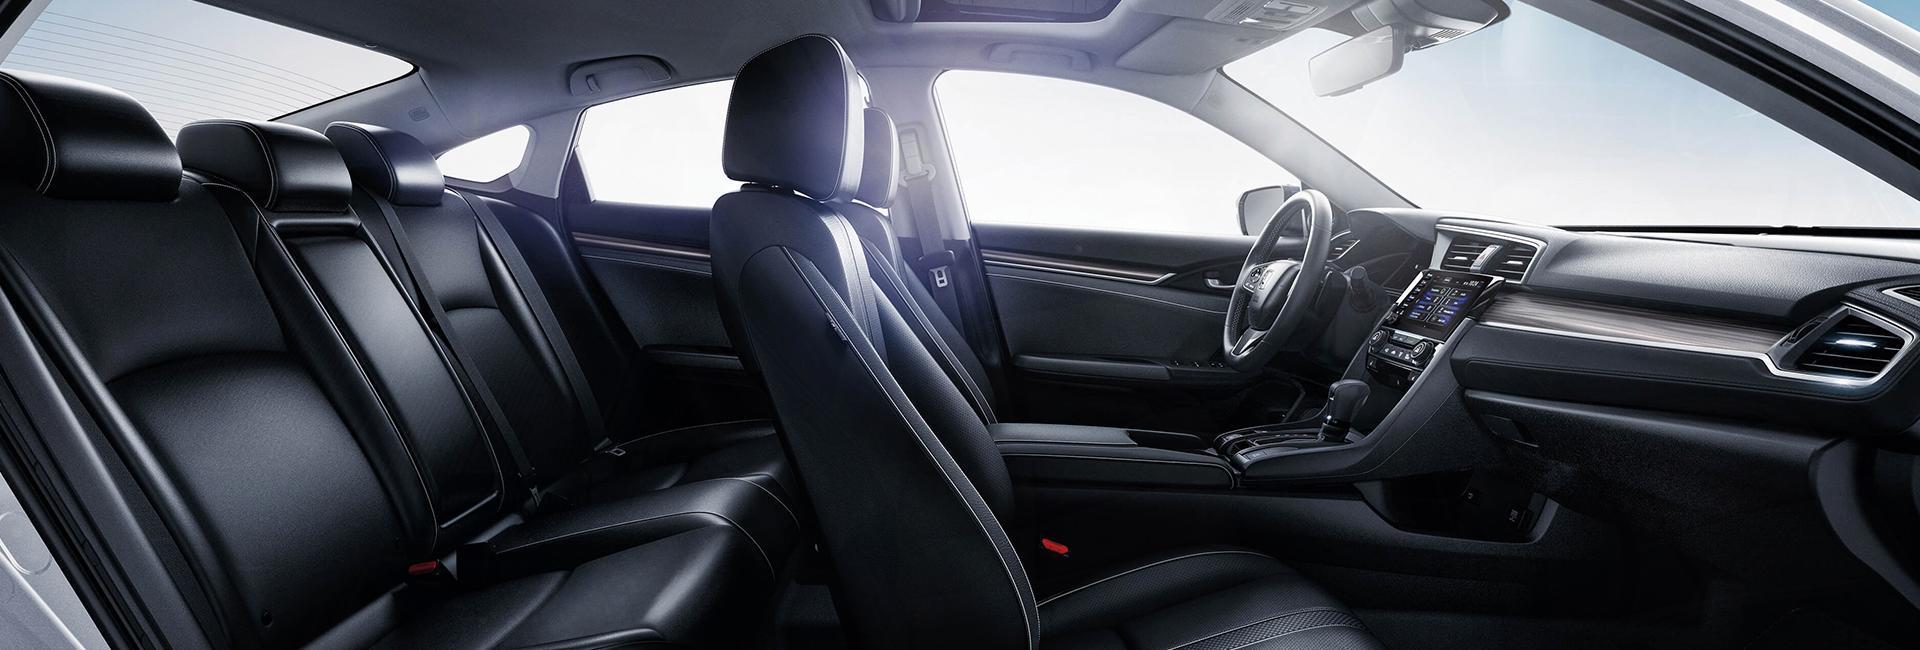 Side view of a Honda Civic interior